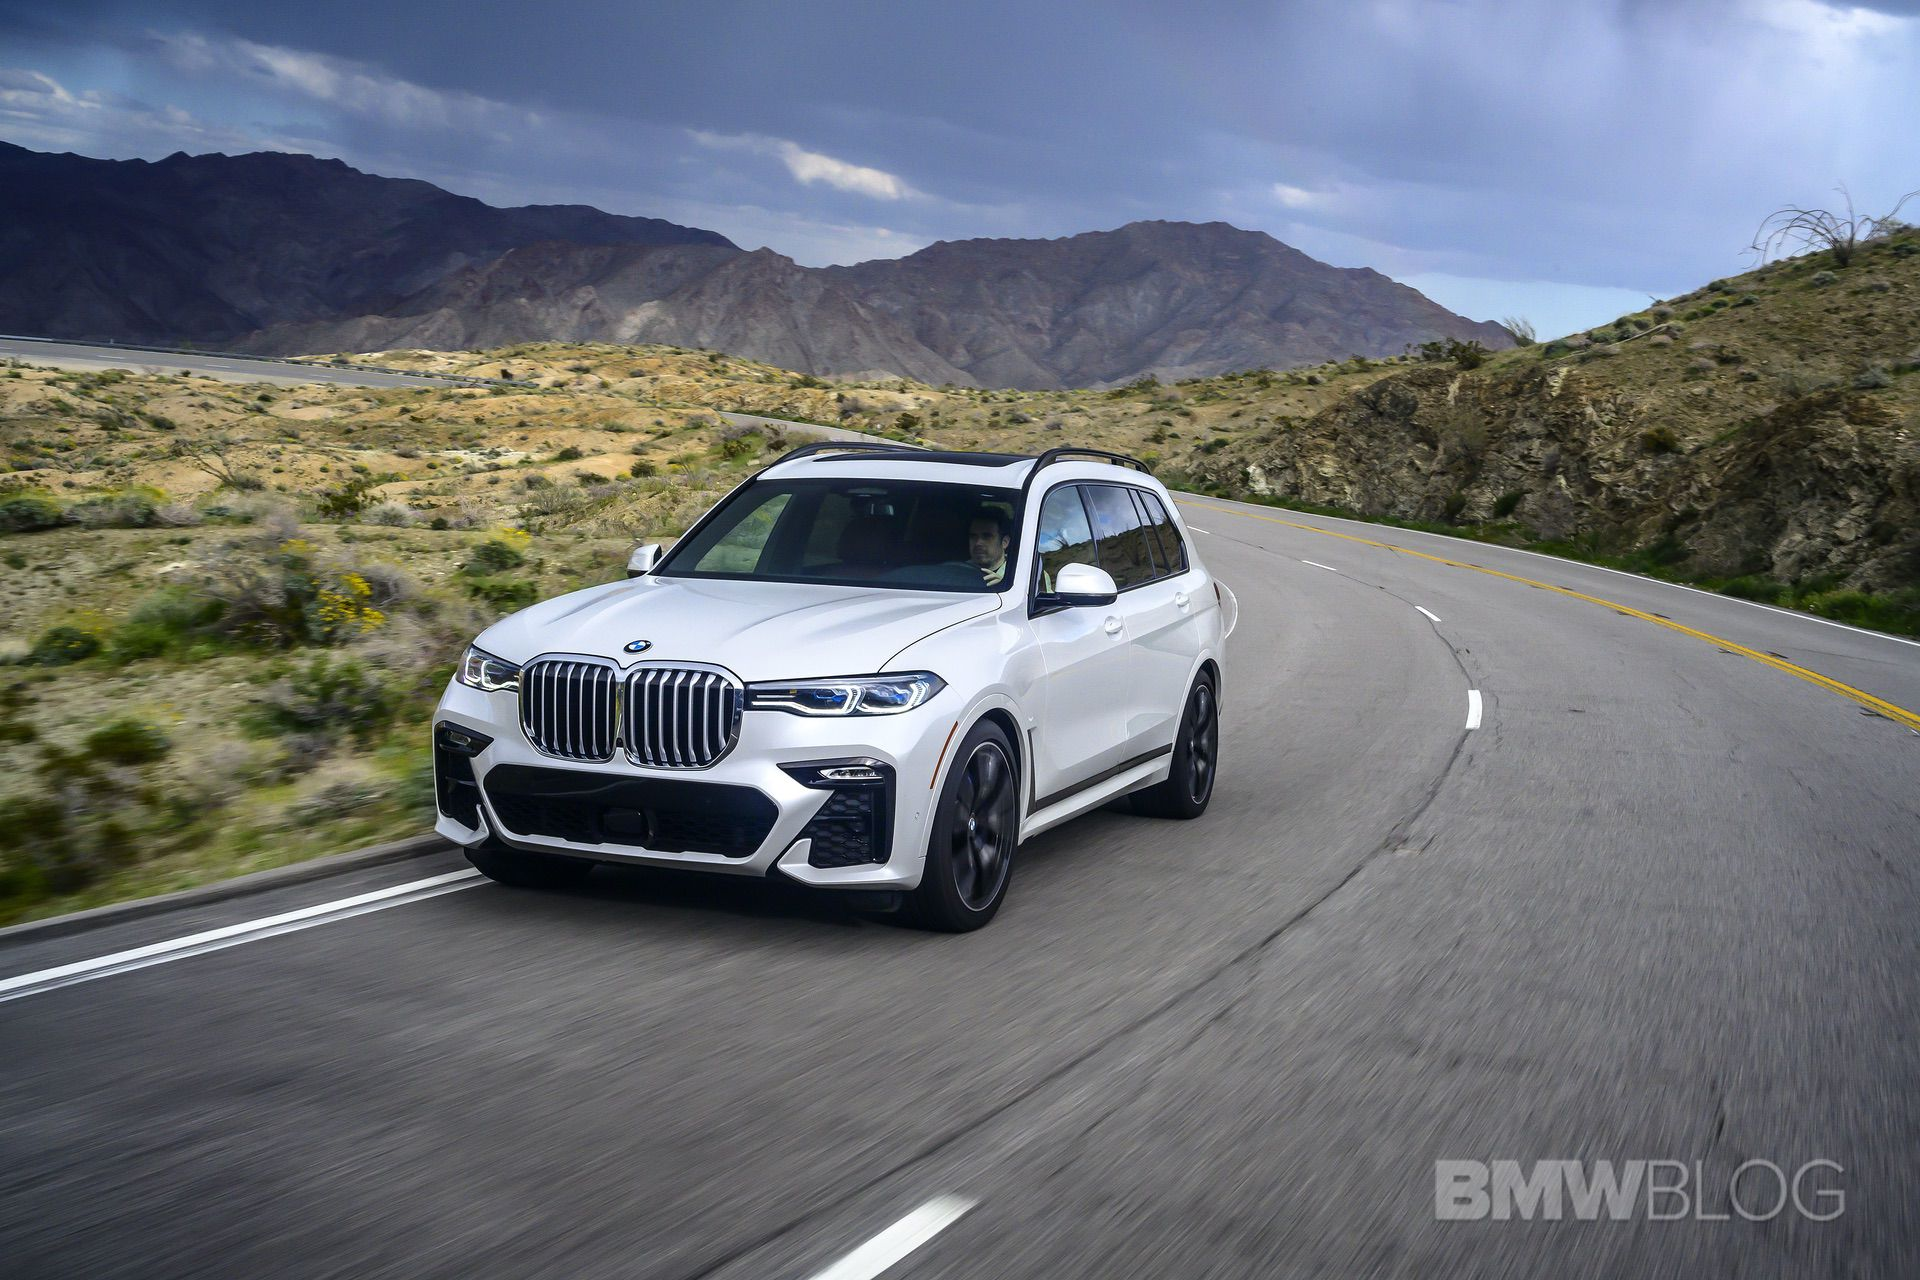 2019 BMW X7 drive 23